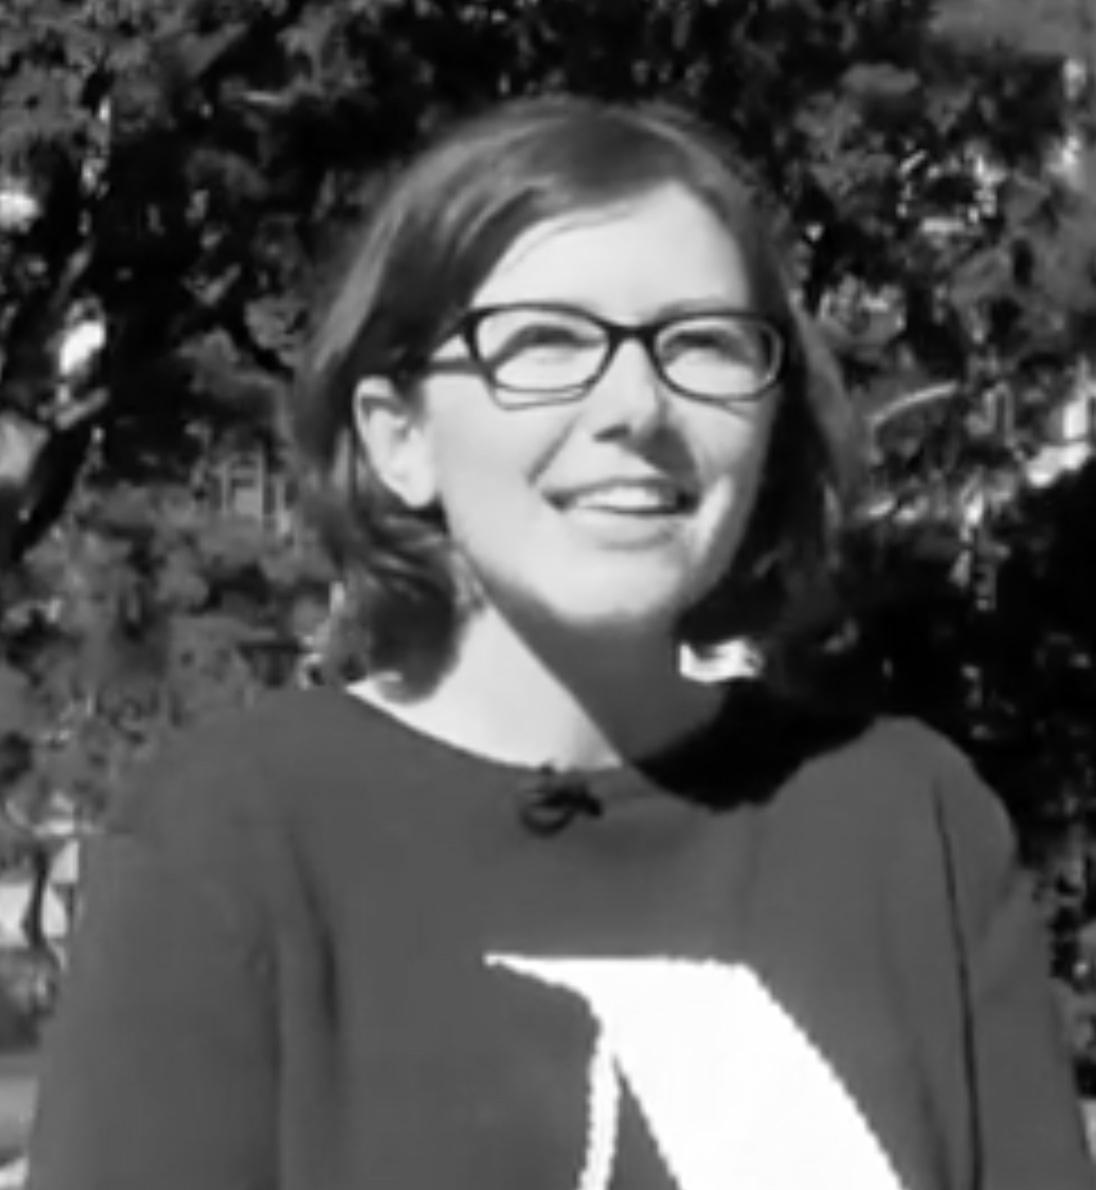 Linda Ellis: Testimonial to Hayley Carr, life coach - she cured my phobia